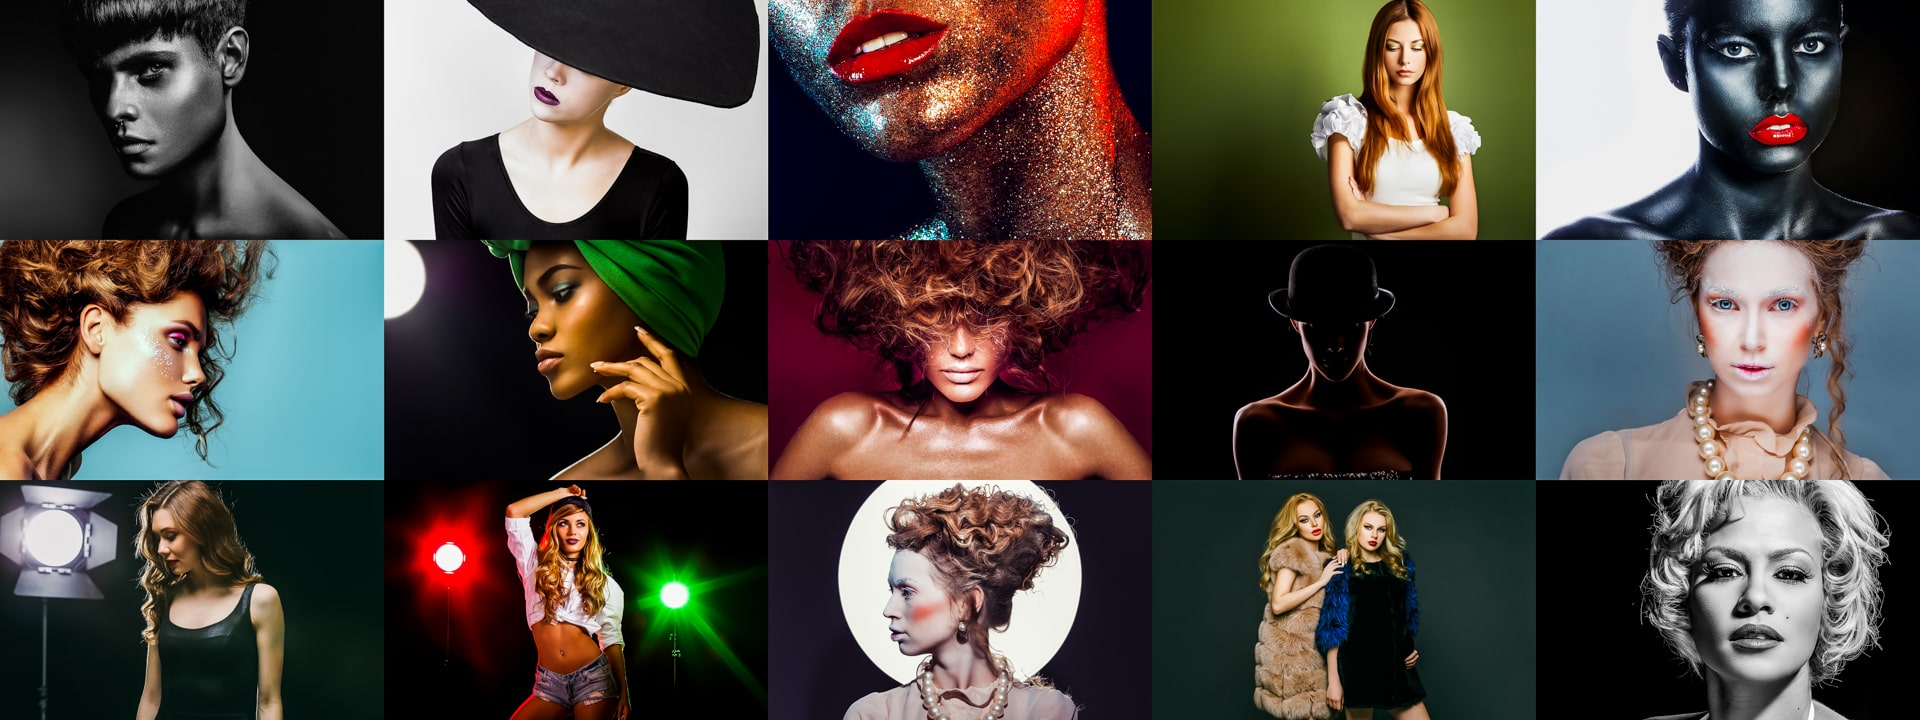 learn to use my studio lights, studio course, studio lighting course, studio lighting workshop, studio photography, studio workshop